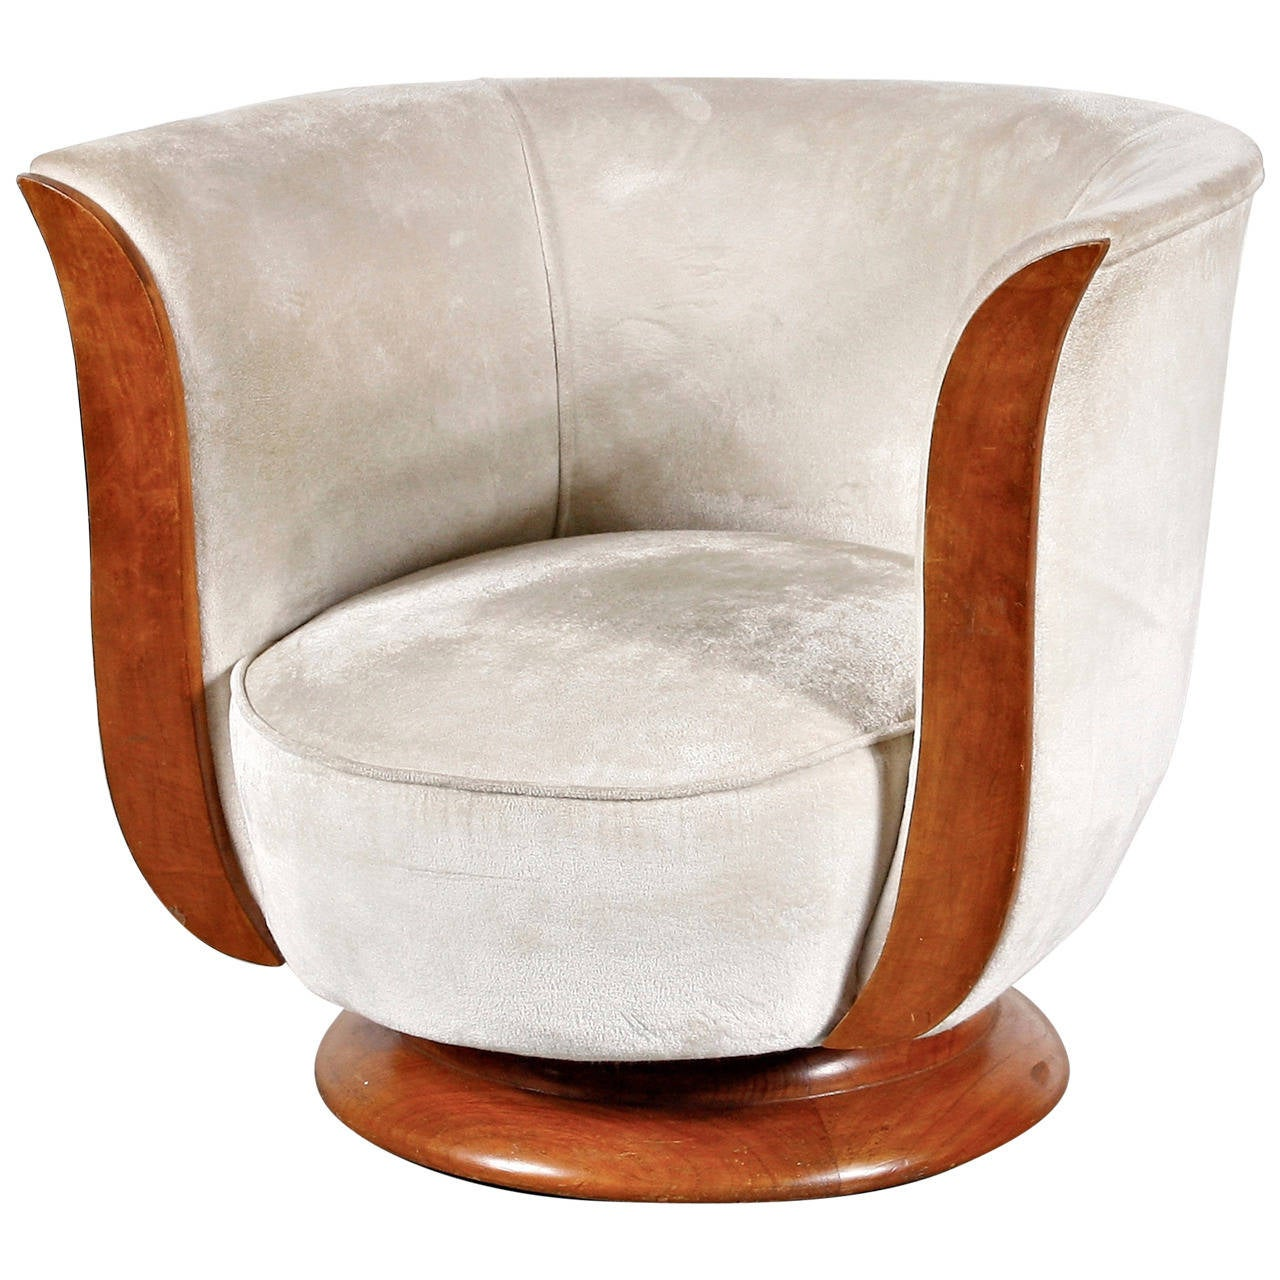 Art Deco Lounge Chair, Hotel Malandre, circa 1930